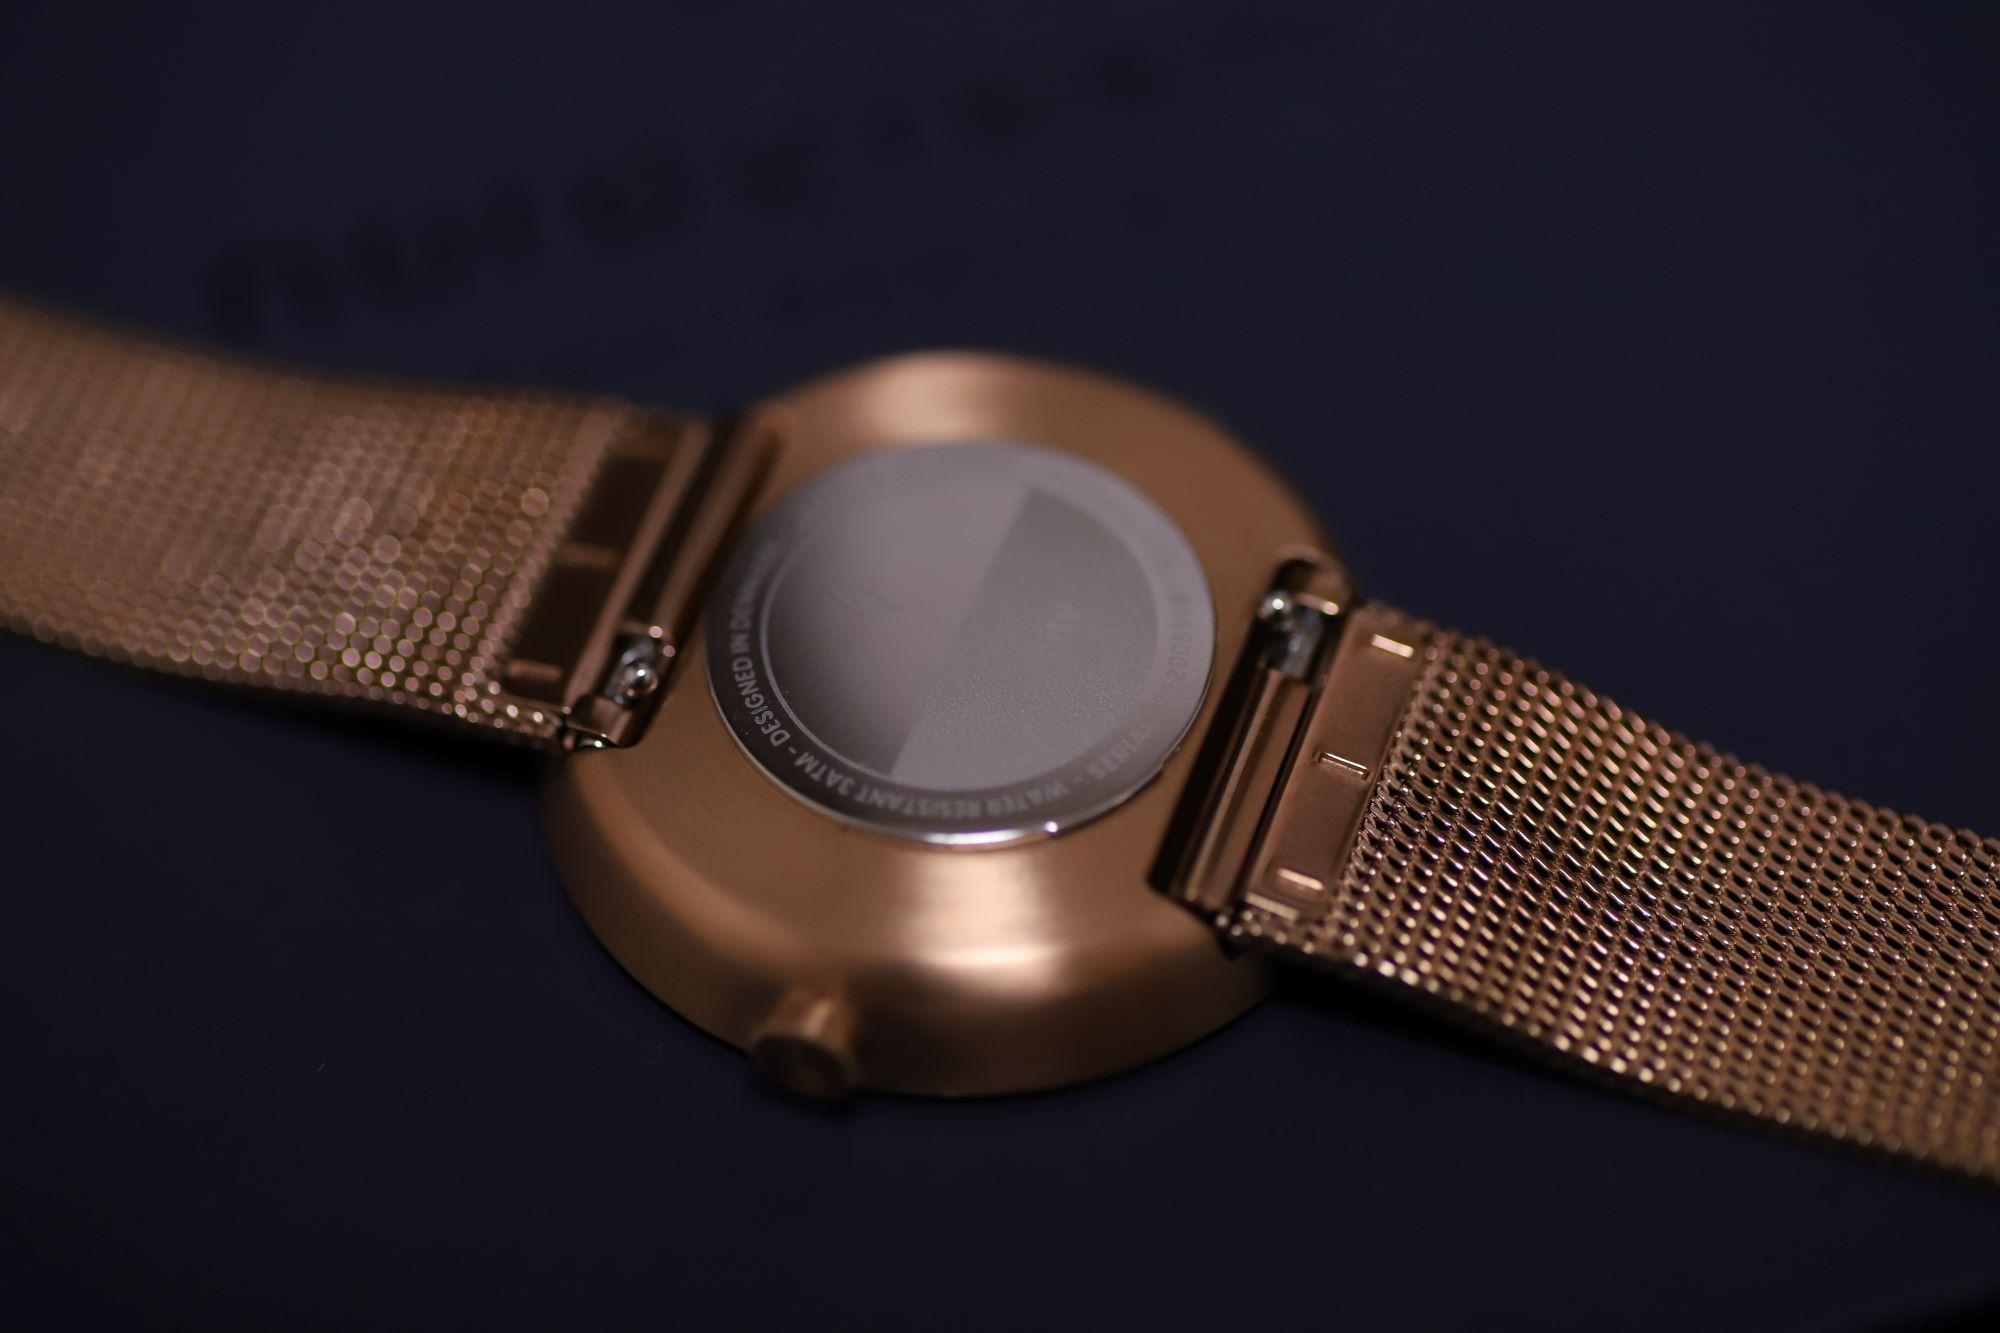 Nordgreen-Infinity-3